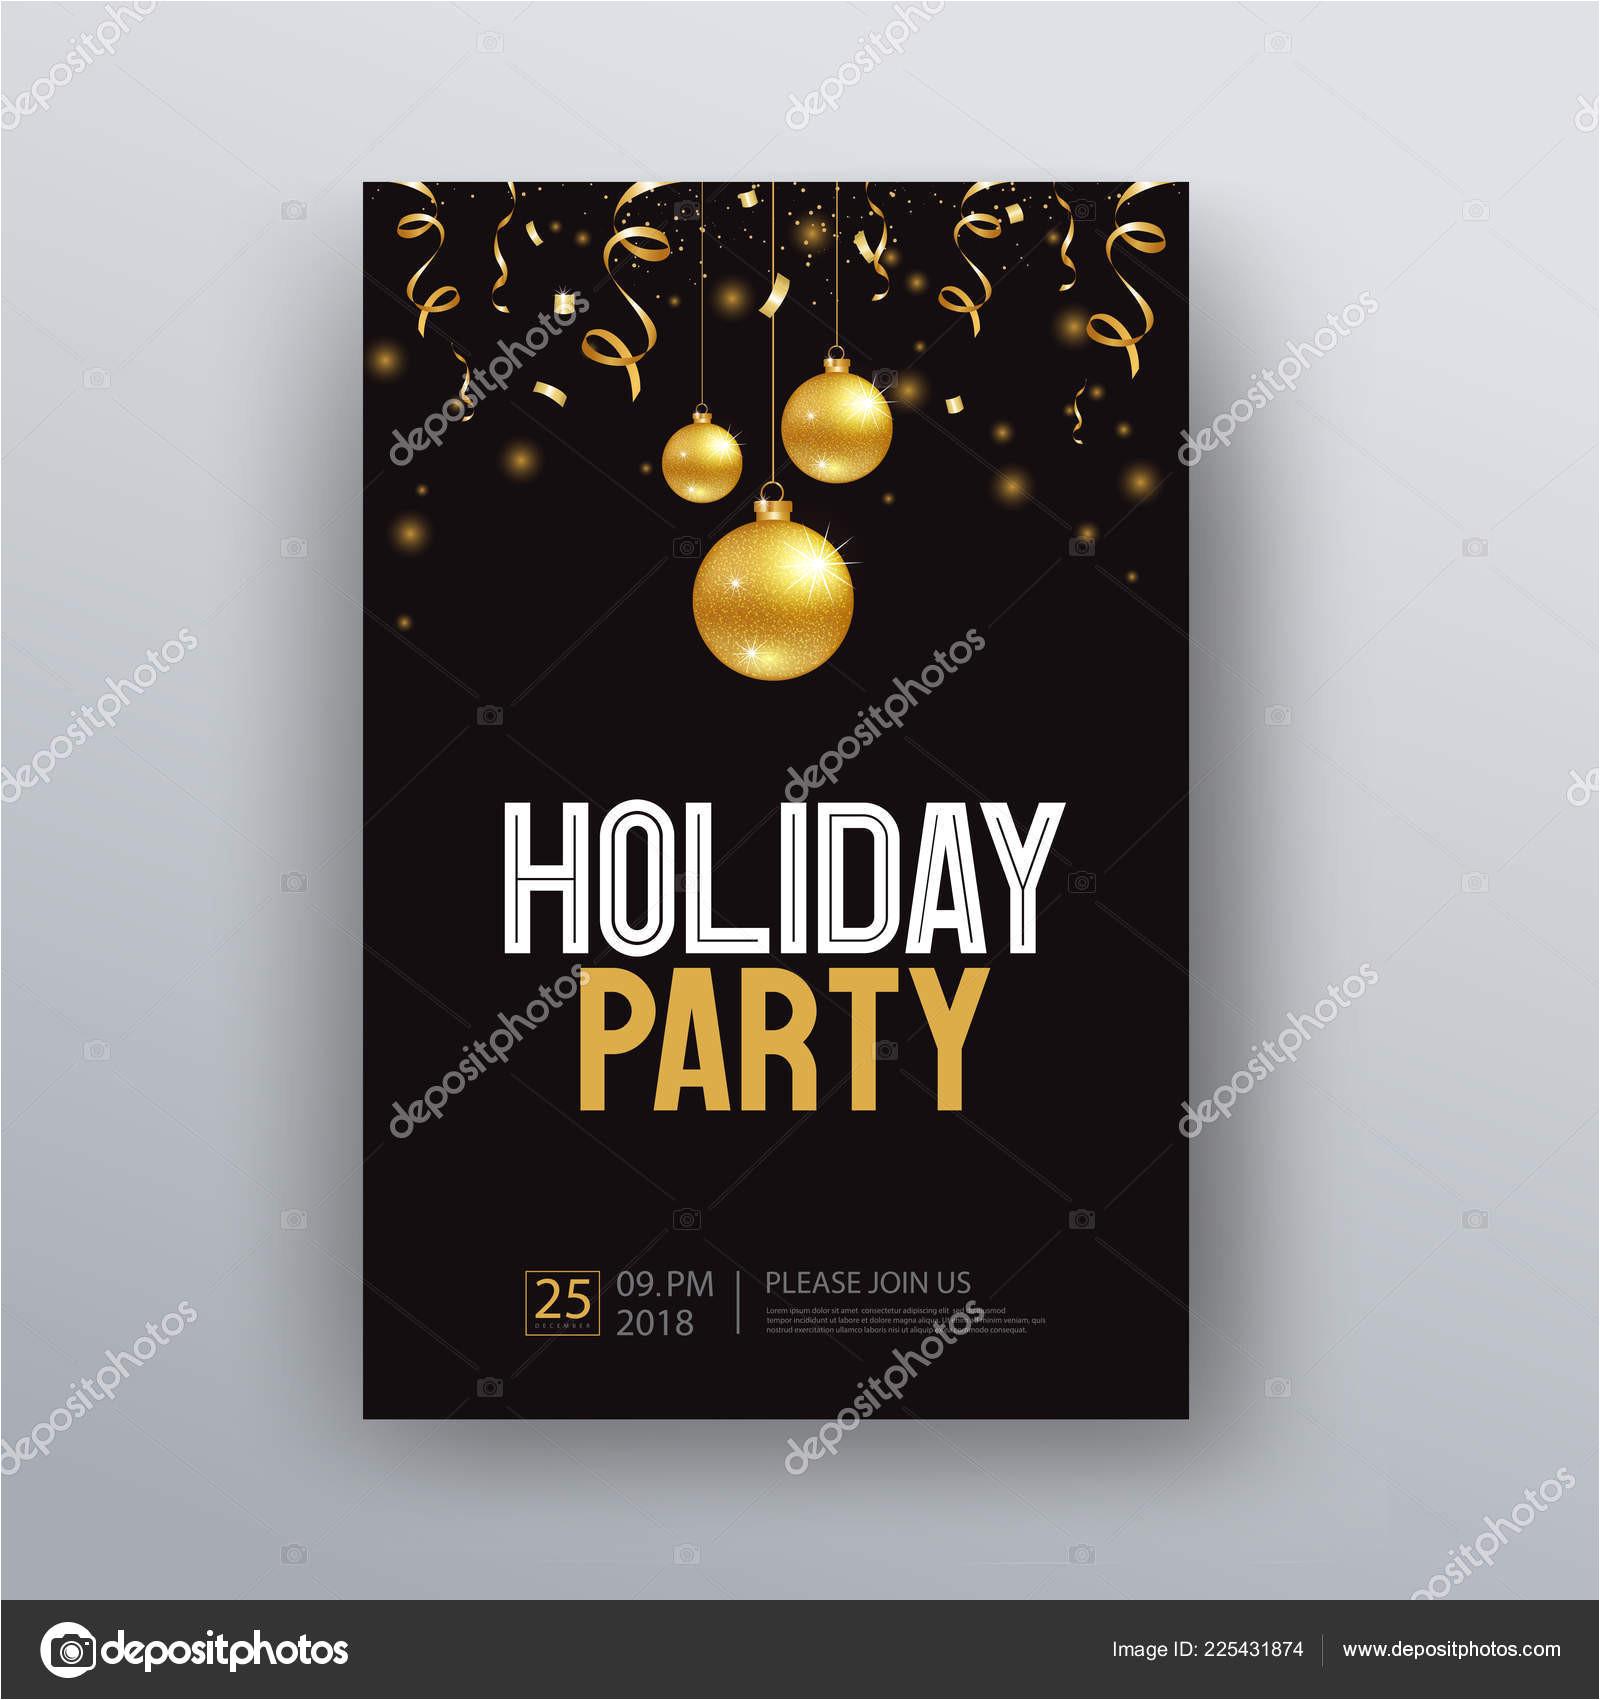 depositphotos 225431874 stock illustration vector illustration design holiday party jpg